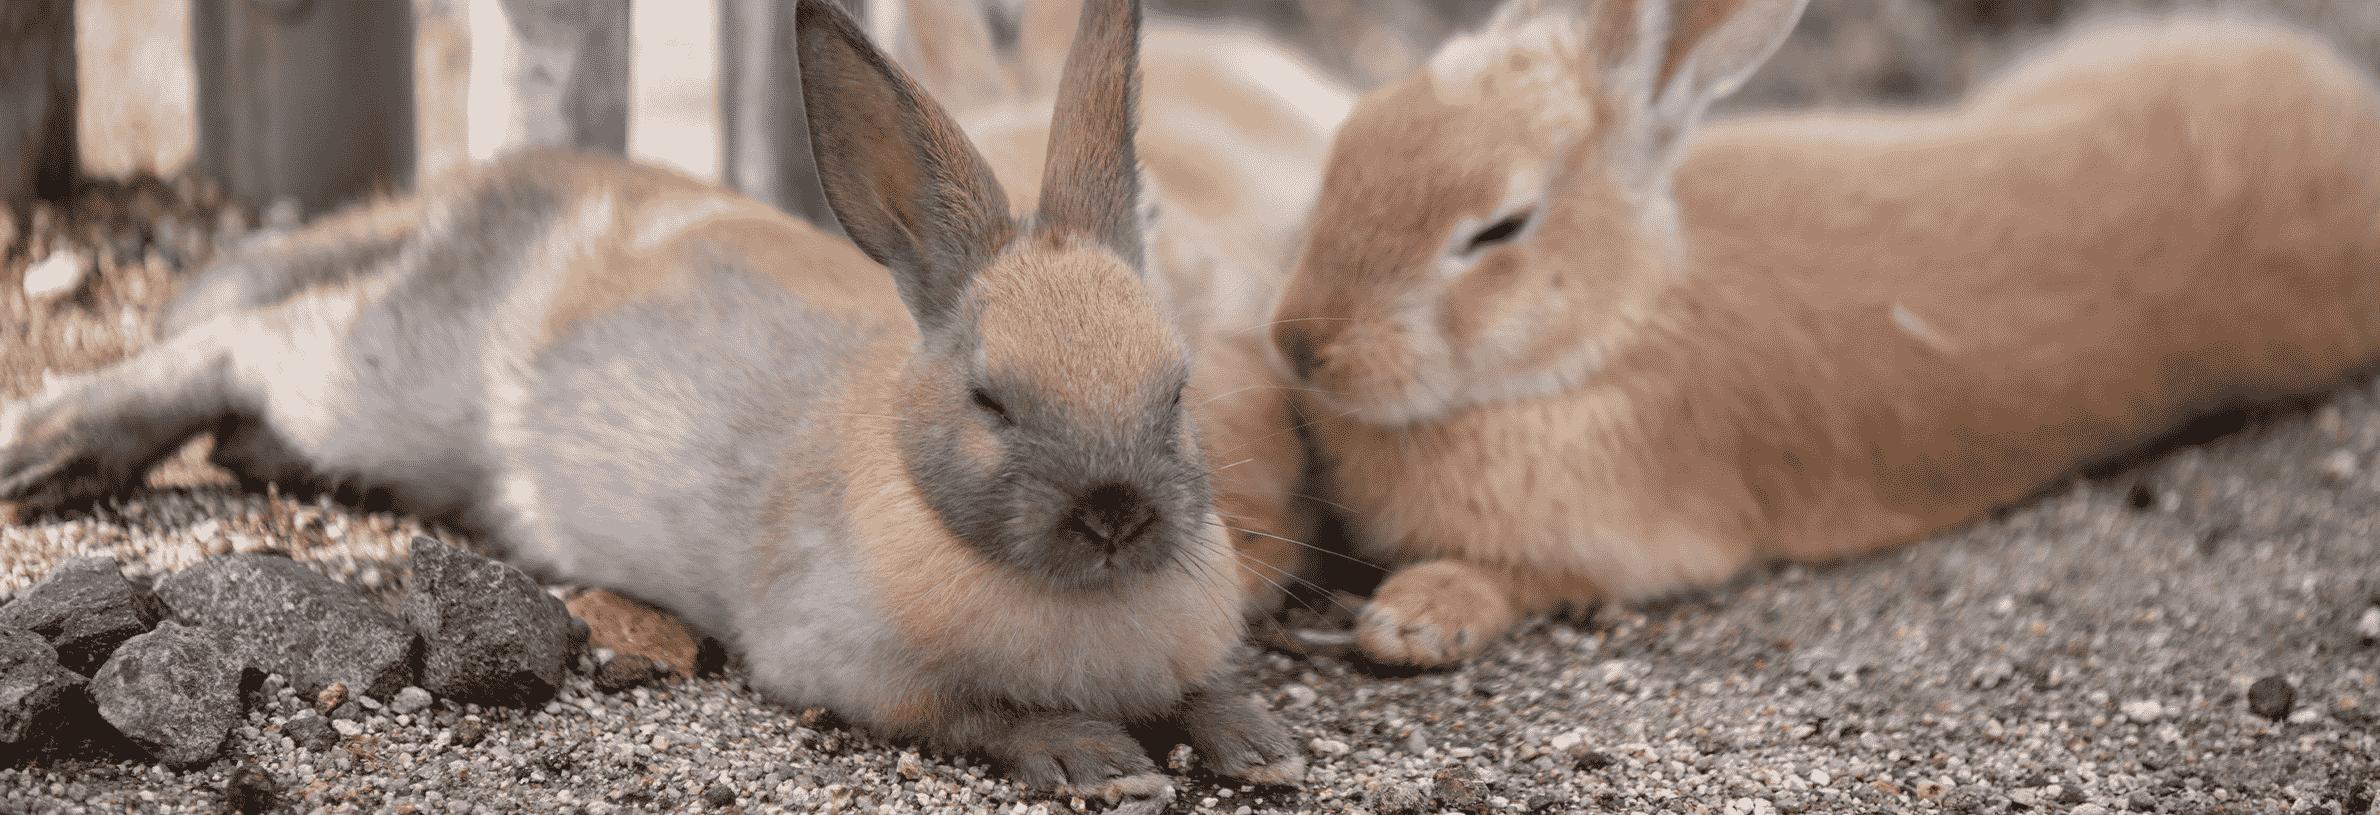 hoe slapen konijnen